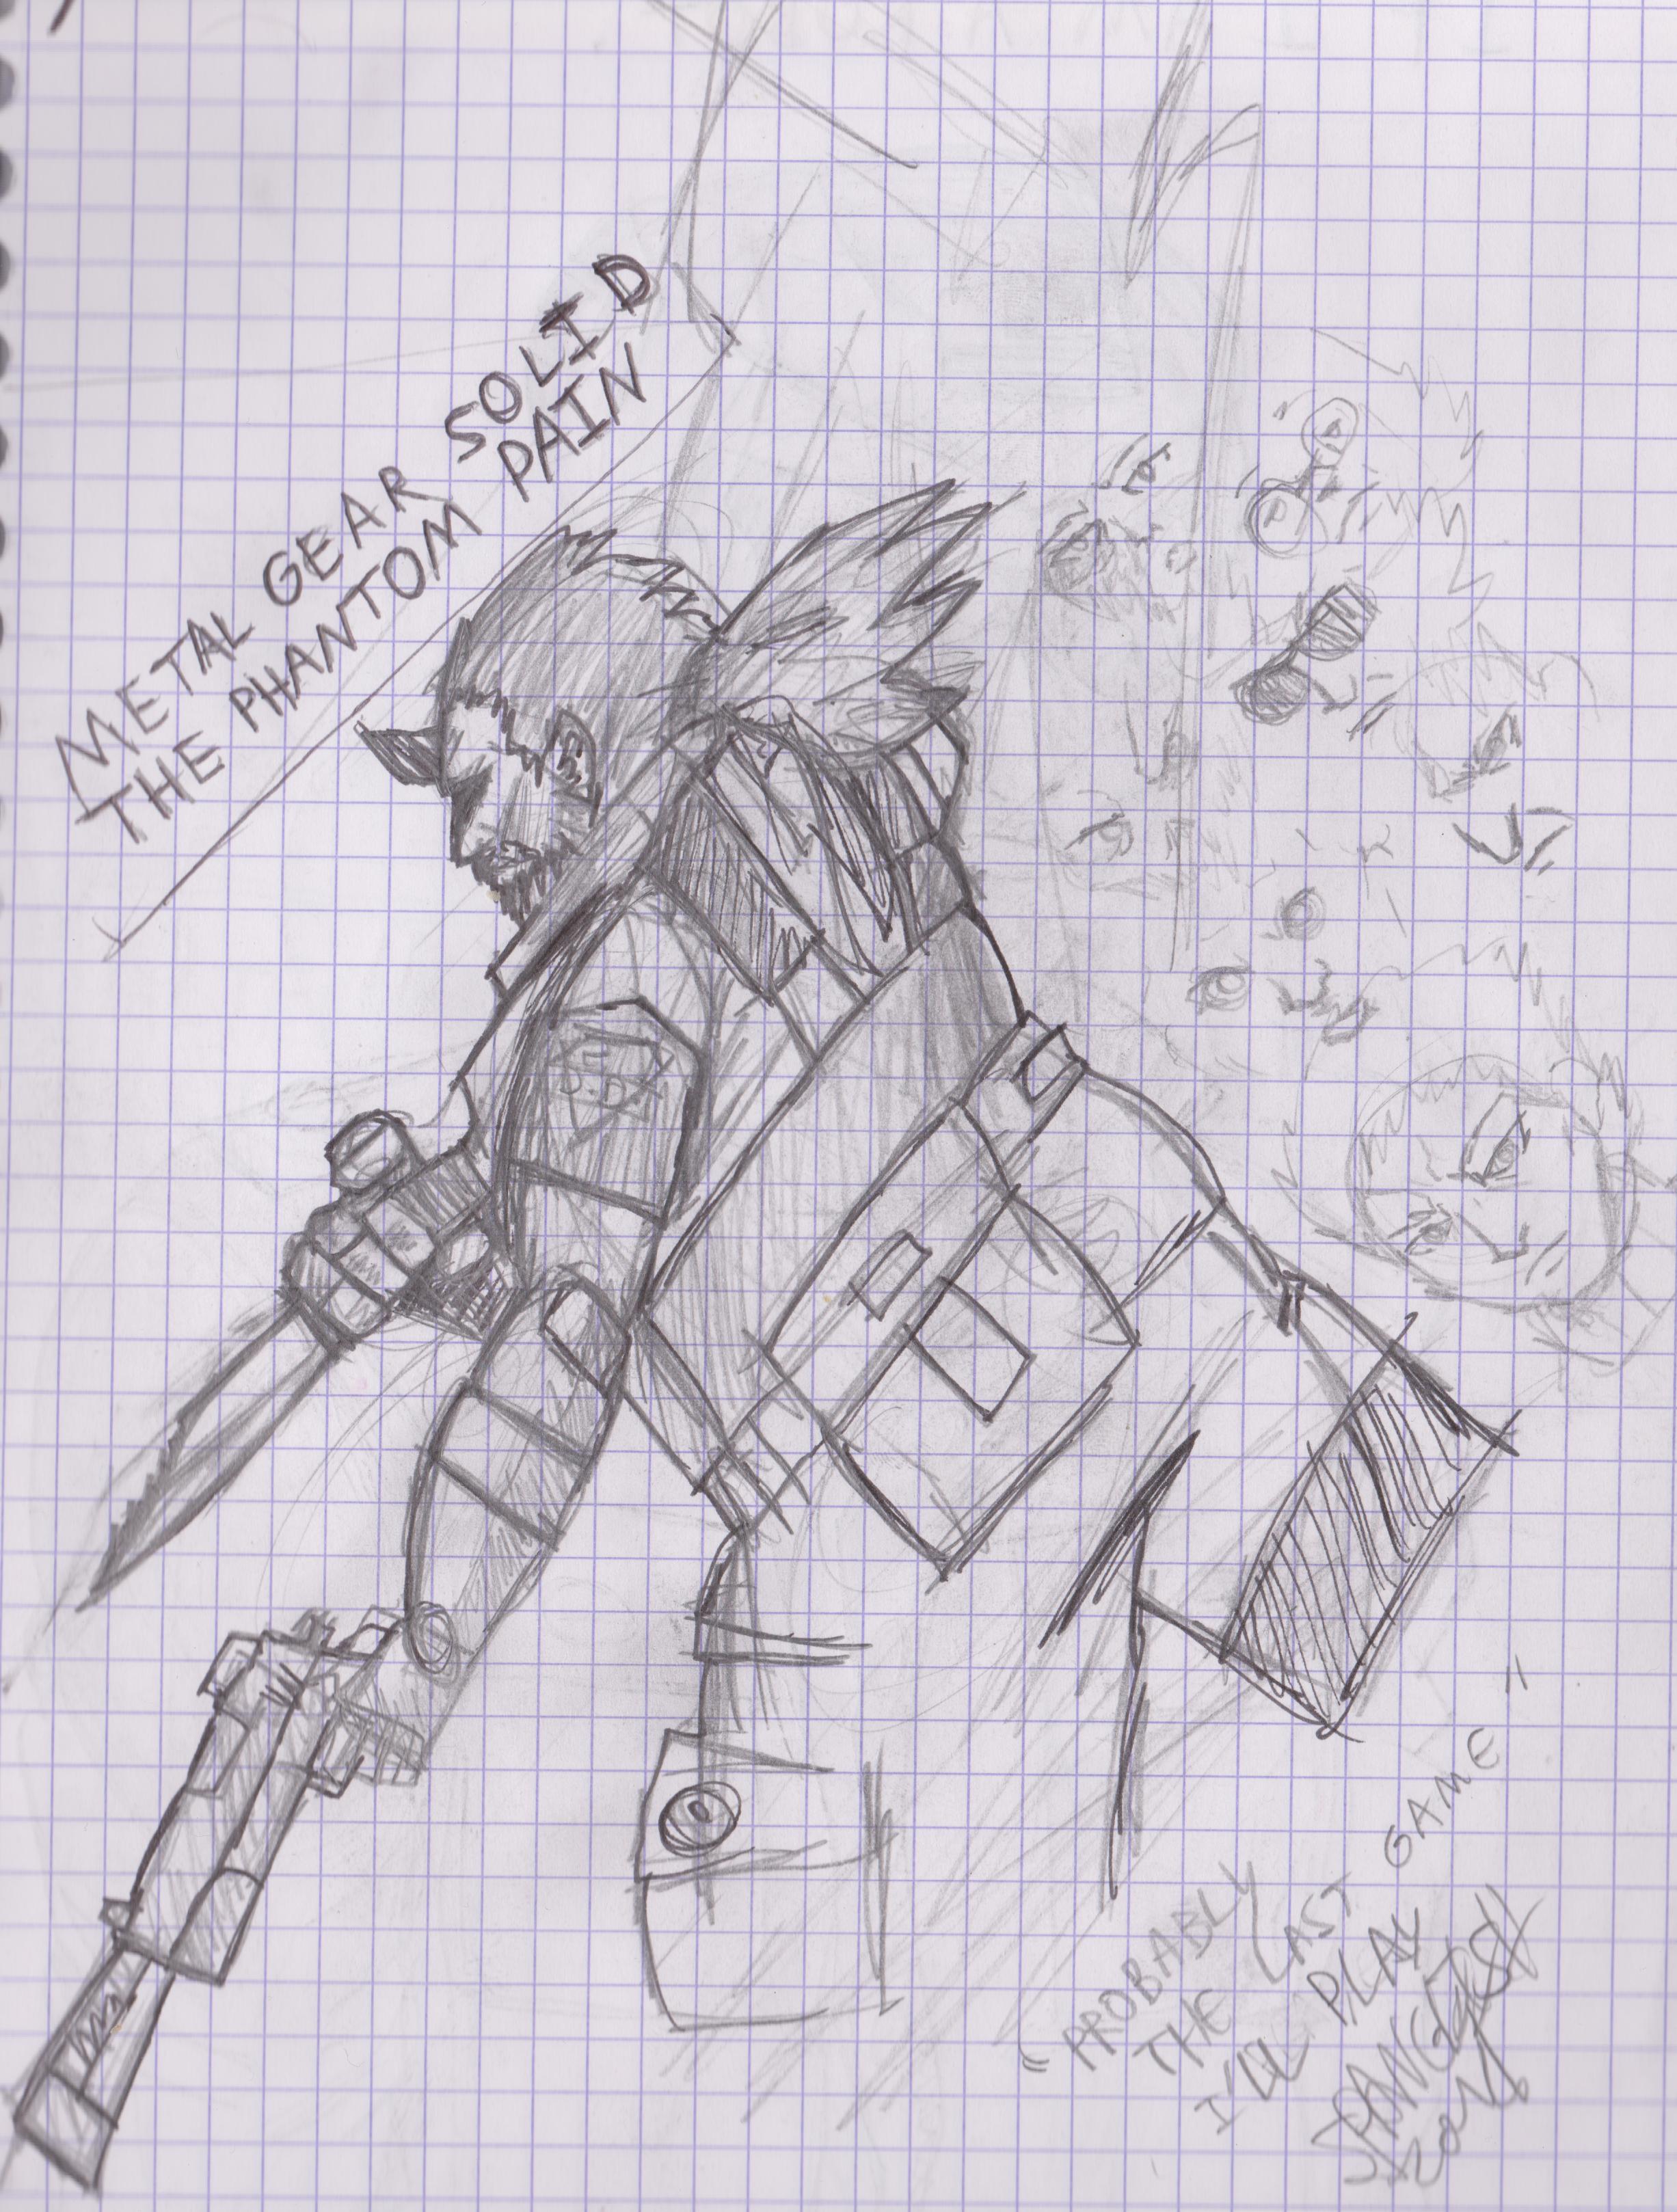 SH sketchbook page 18